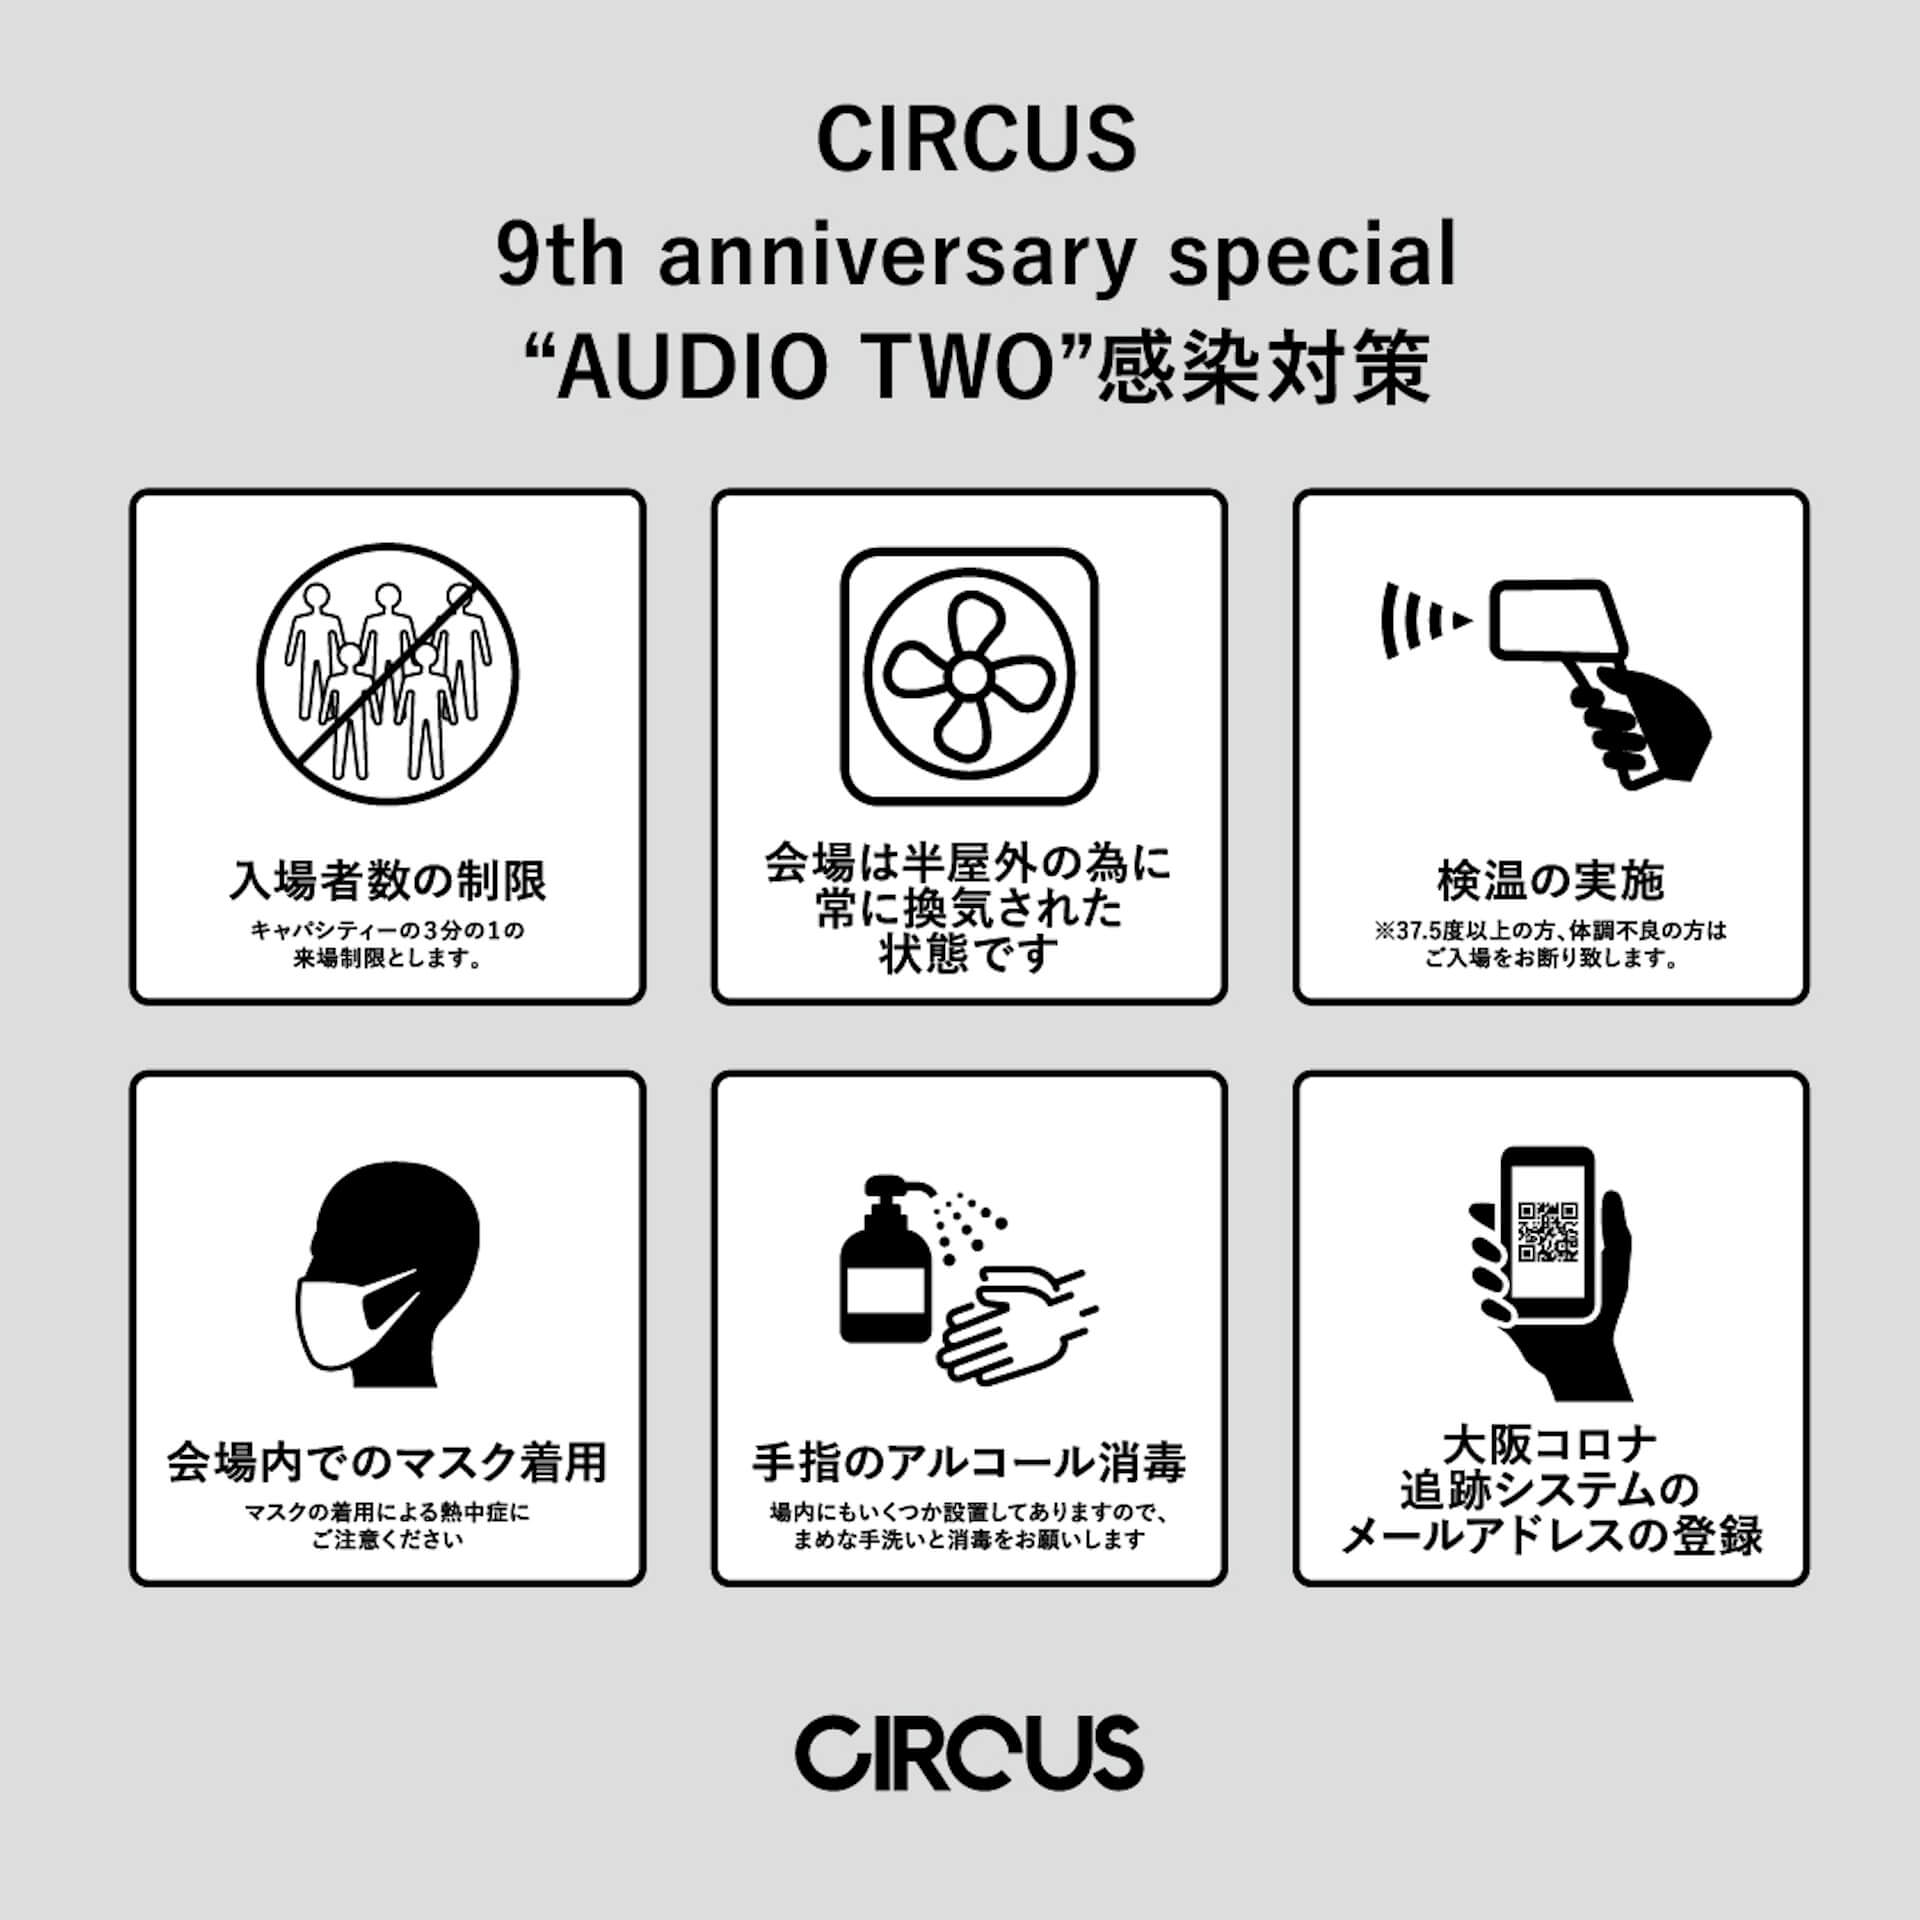 CIRCUS OSAKA9周年番外編<AUDIO TWO>のタイムテーブル&アフターパーティーが発表! music210720_circusosaka_audiotwo_4